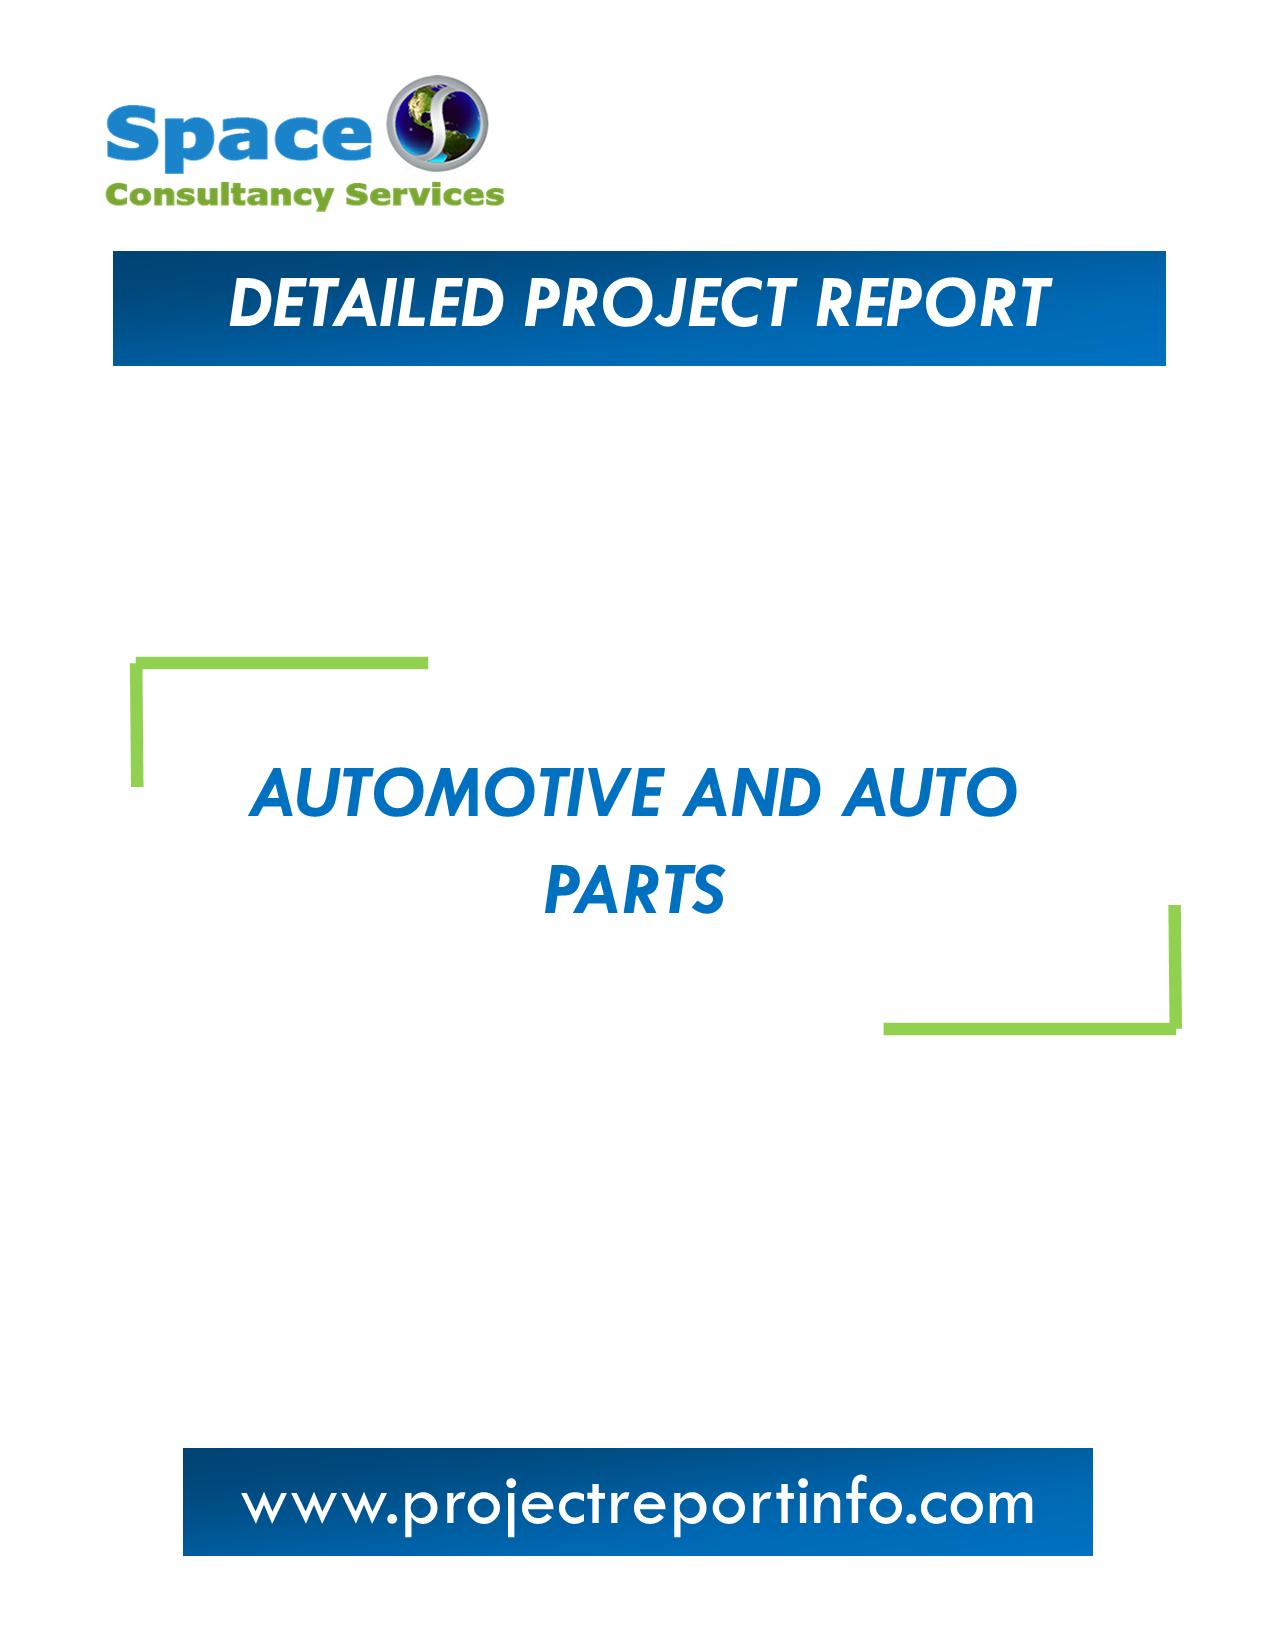 Automotive and Auto Parts